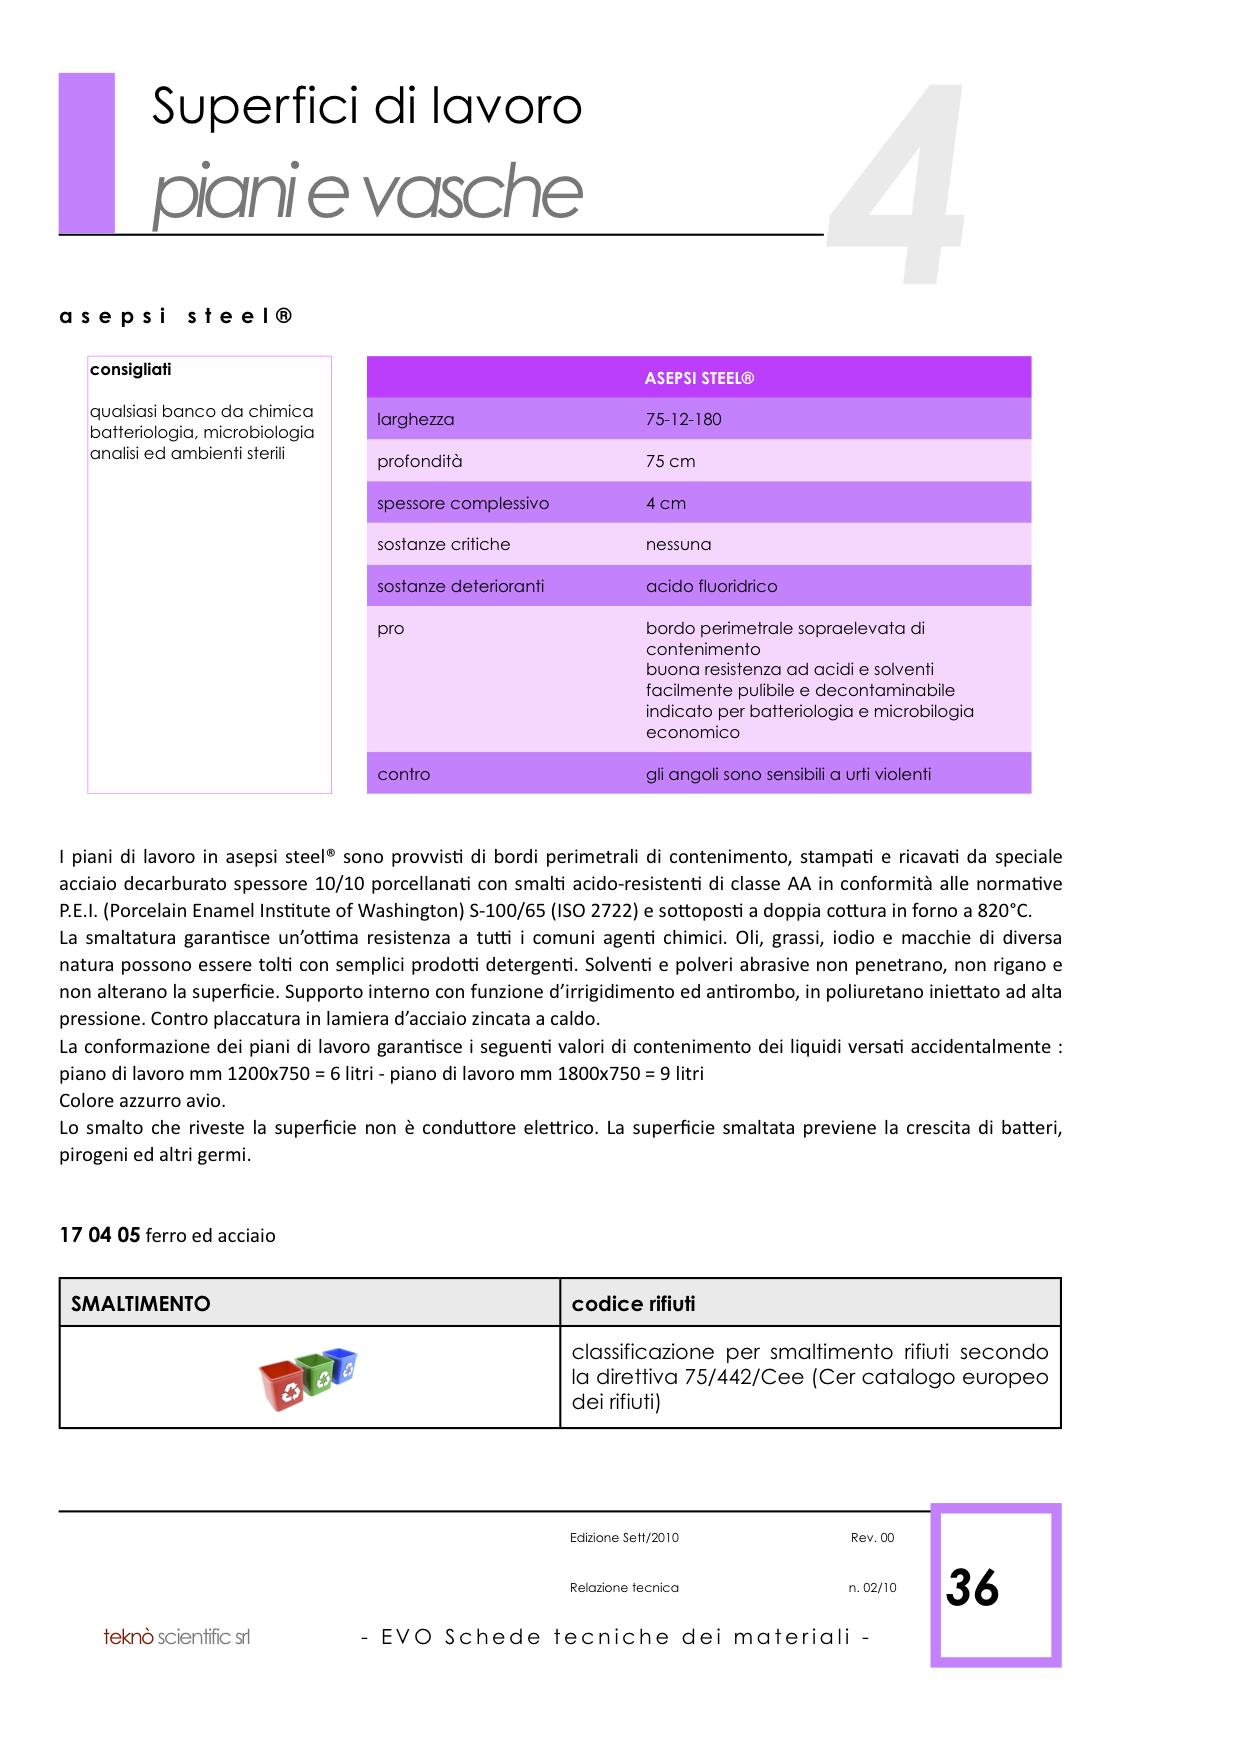 EVO Schede Tecniche materiali copia 6.png